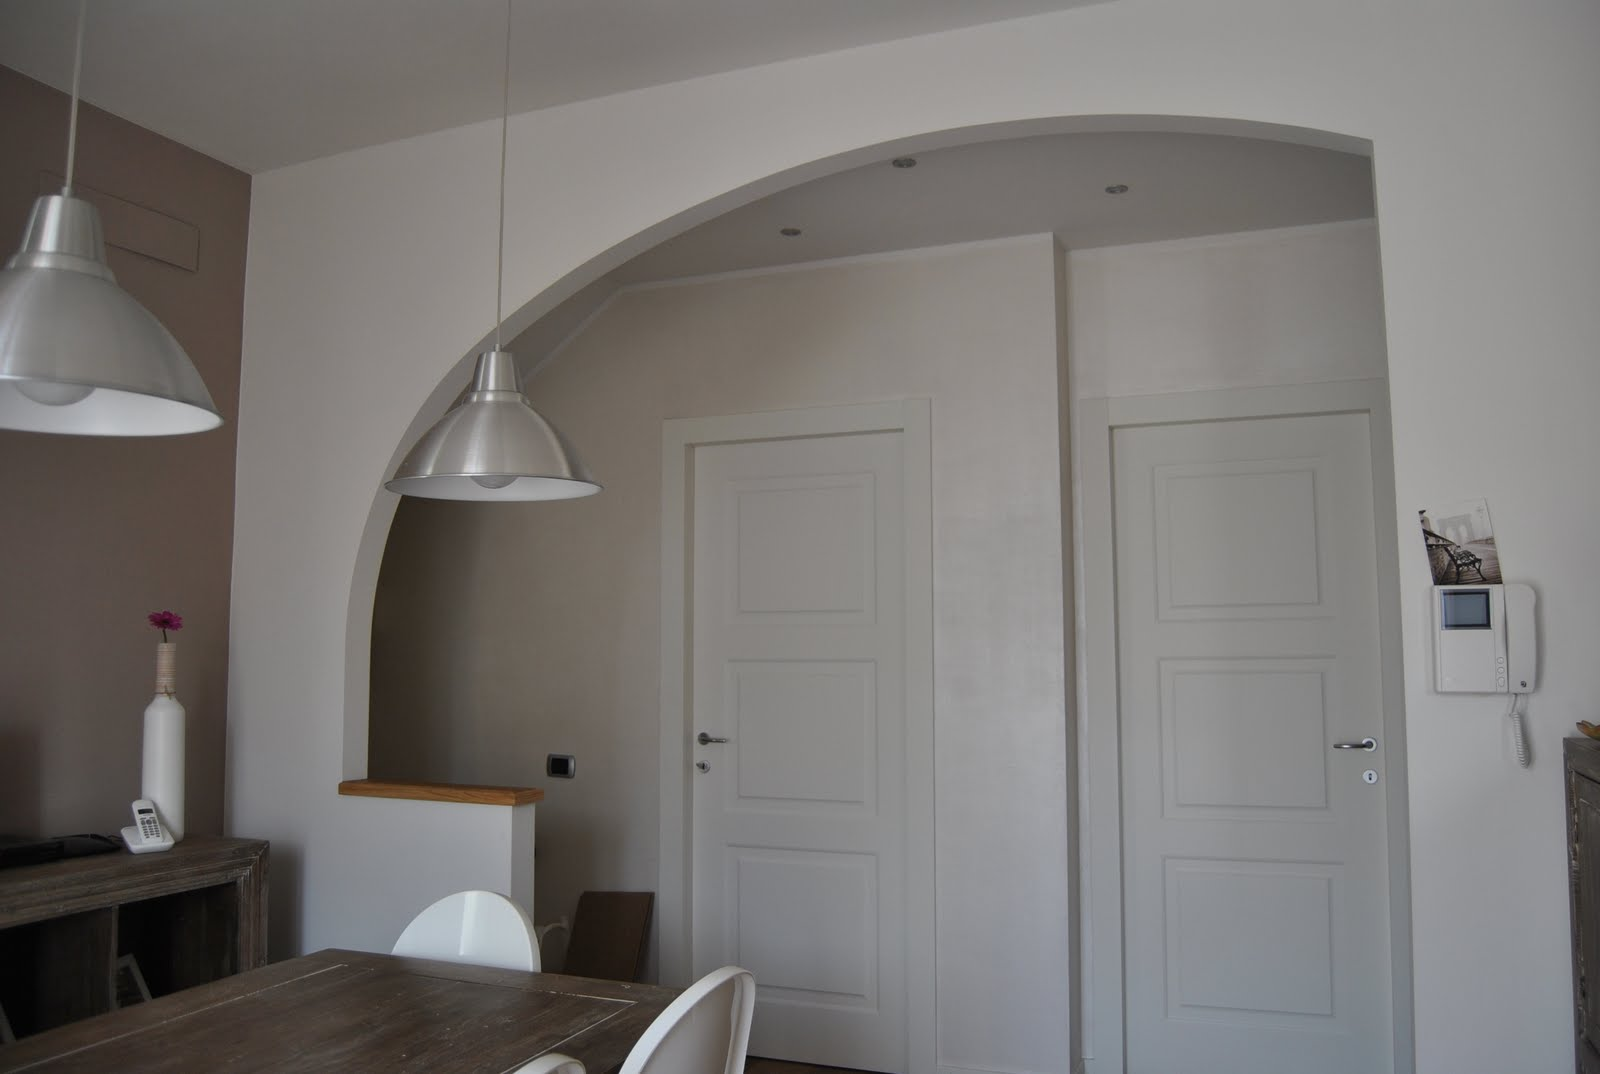 Arco cartongesso firenze - Archi in gesso per interni ...